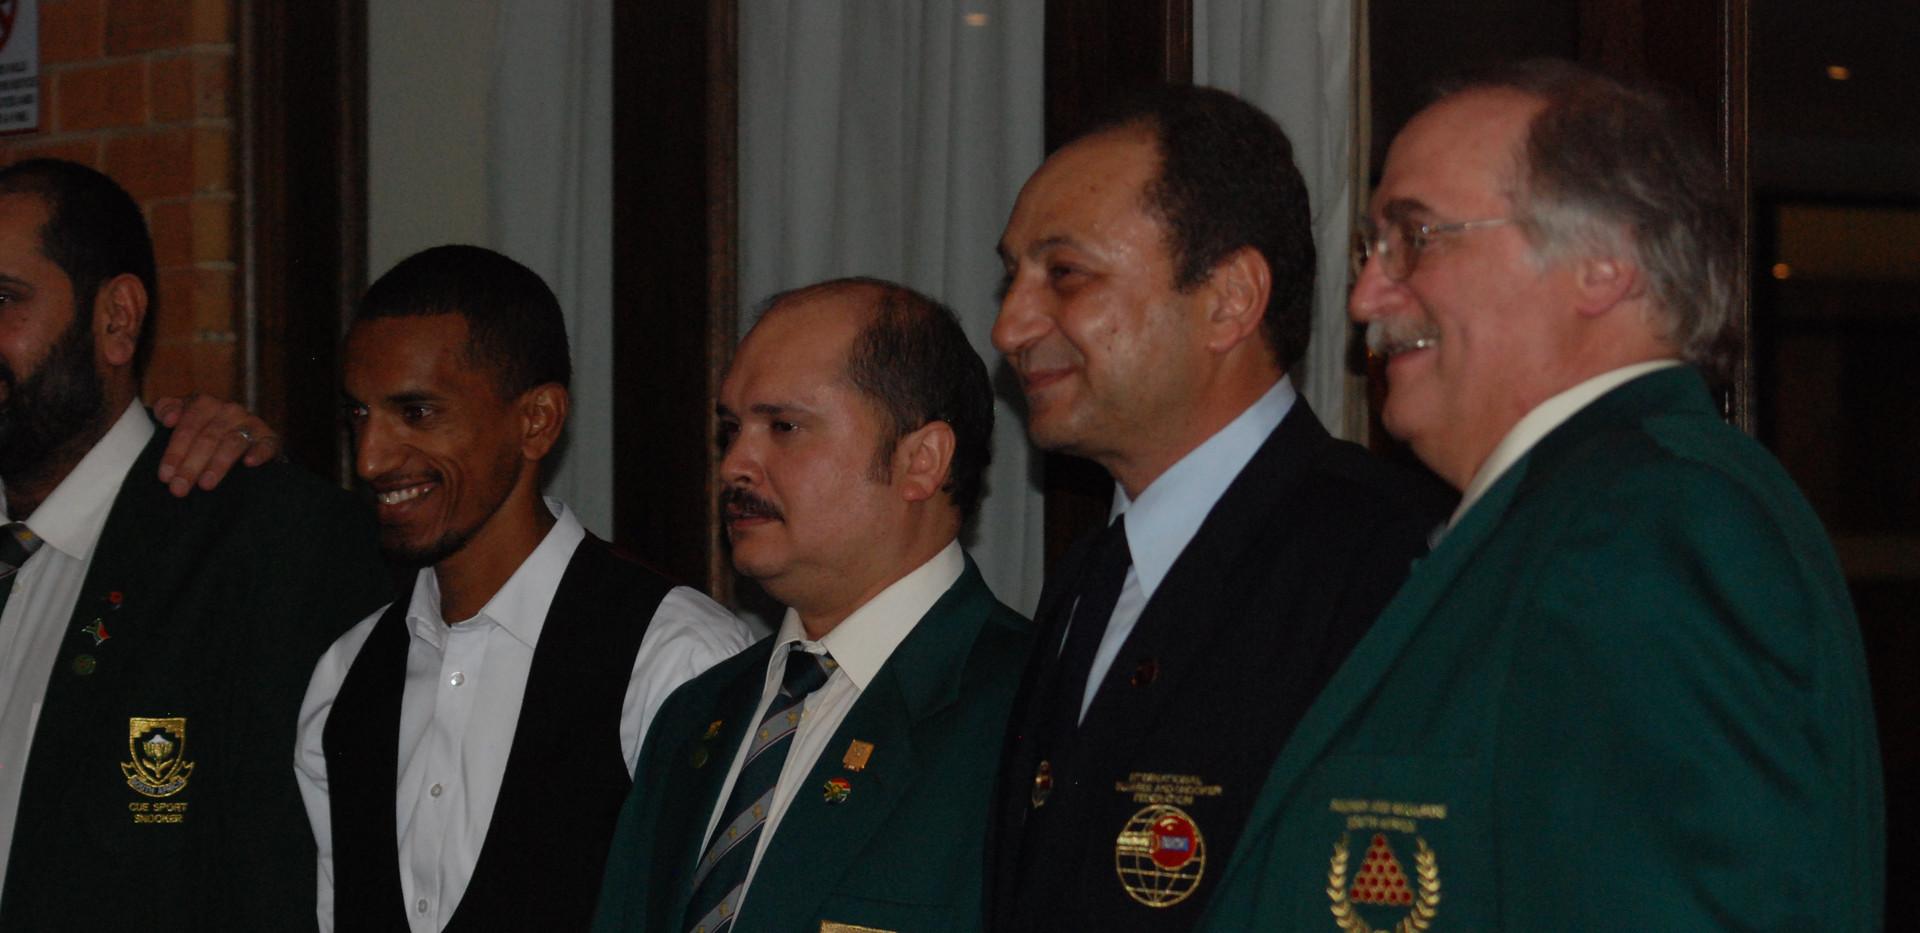 South Africa 2012-34.JPG